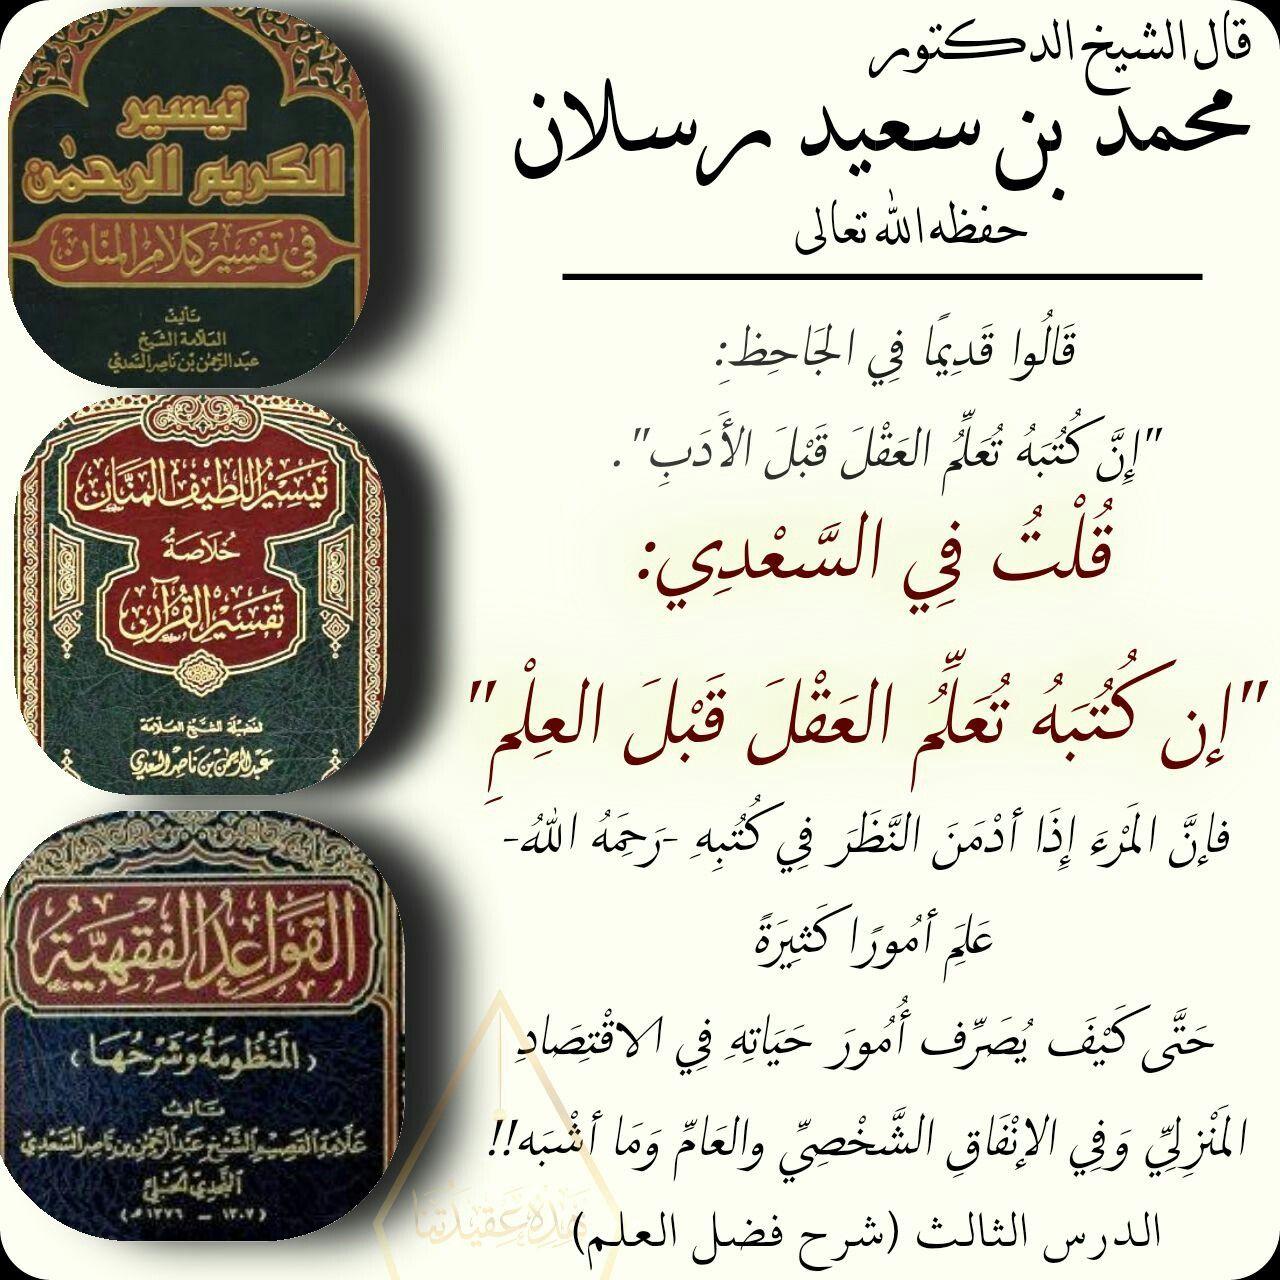 Pin By زهرة الياسمين On طلب العلم Knowledge Avl Alia